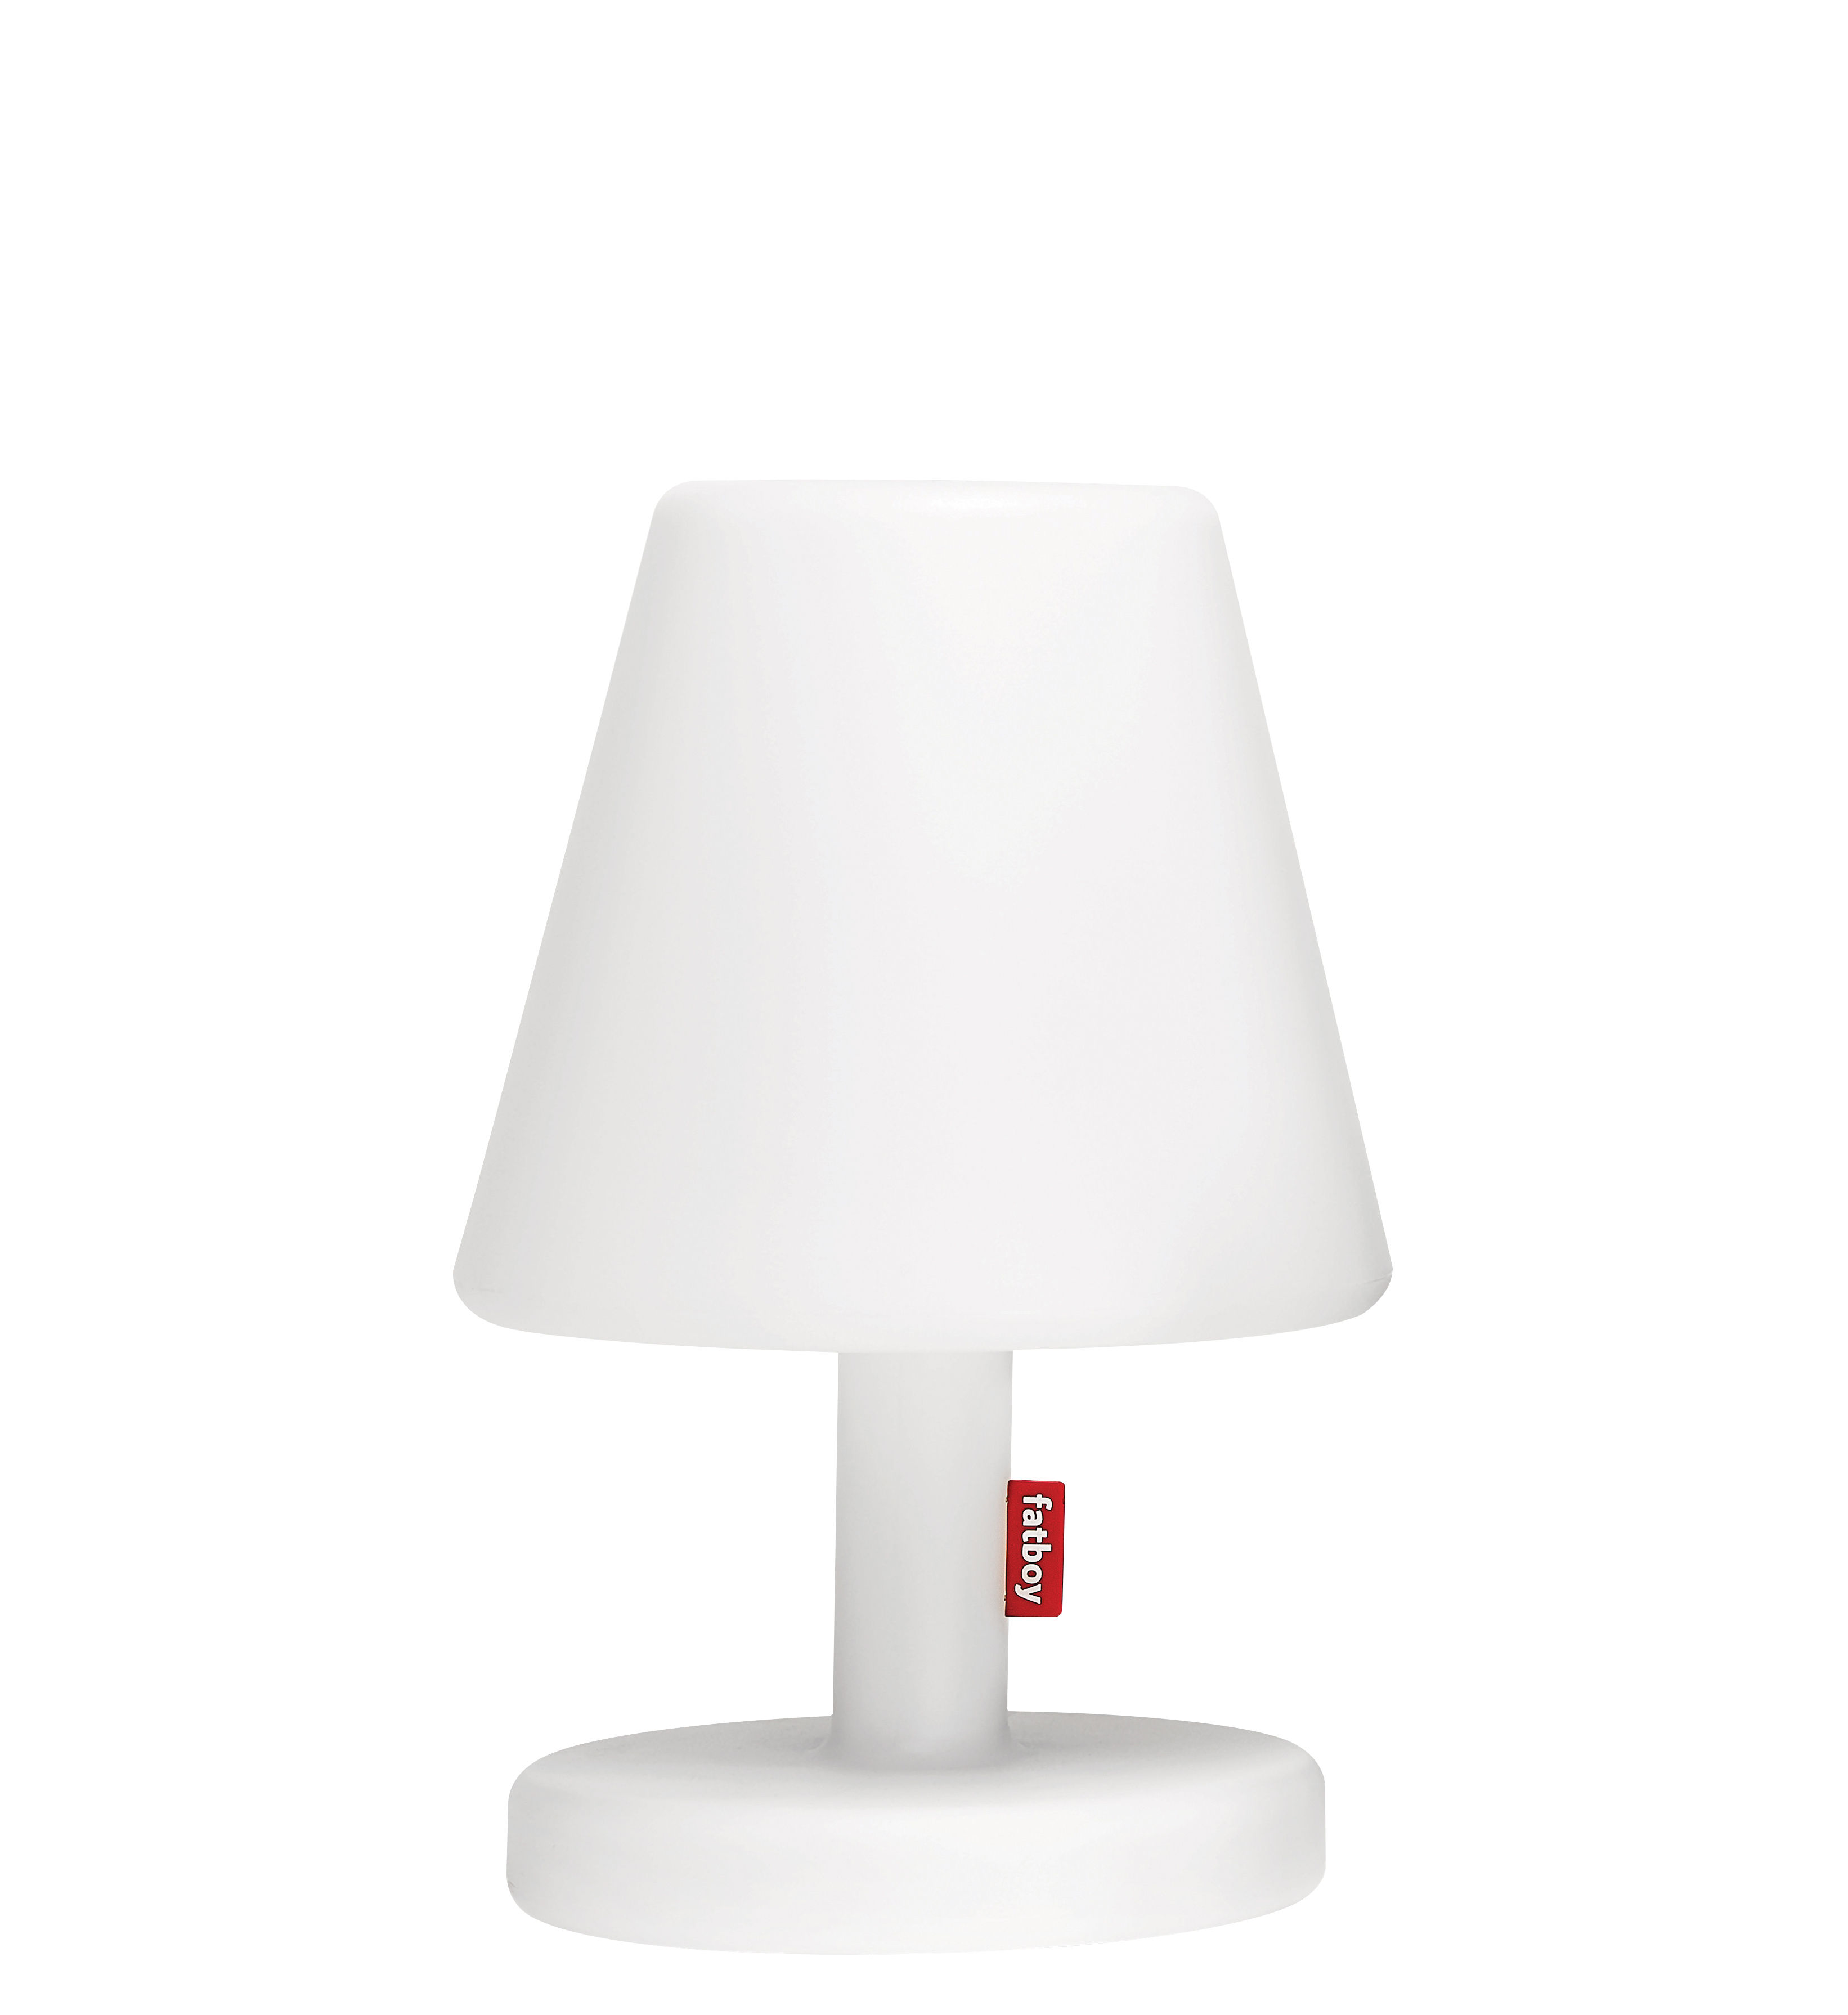 Luminaire - Lampes de table - Lampe Edison the Medium Bluetooth / H 51 cm - LED - Fatboy - Blanc / Bluetooth - Polyéthylène